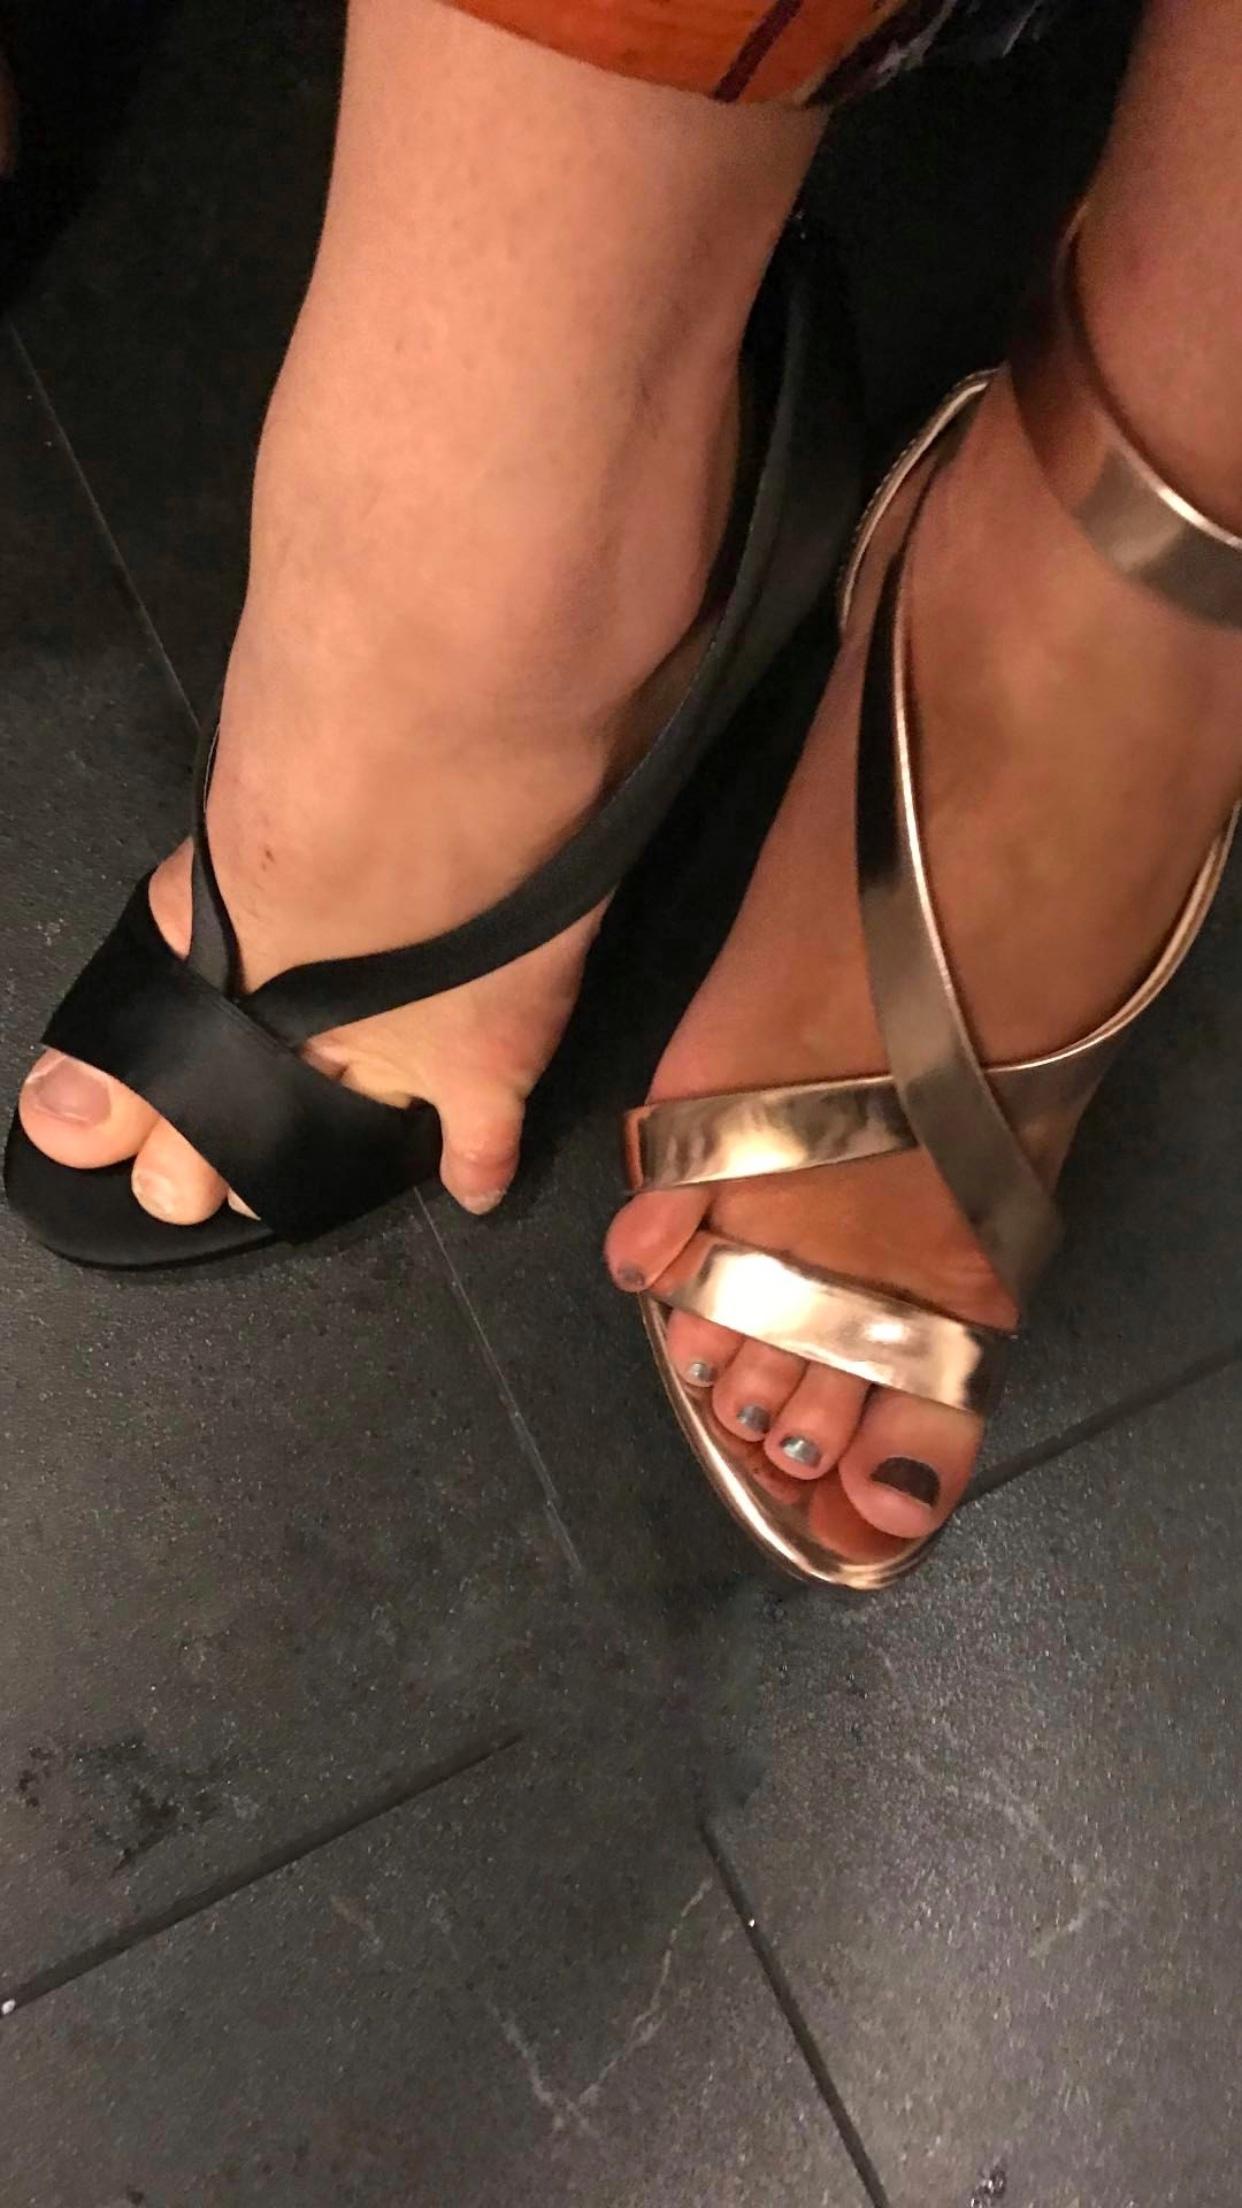 Lele Ponss Feet